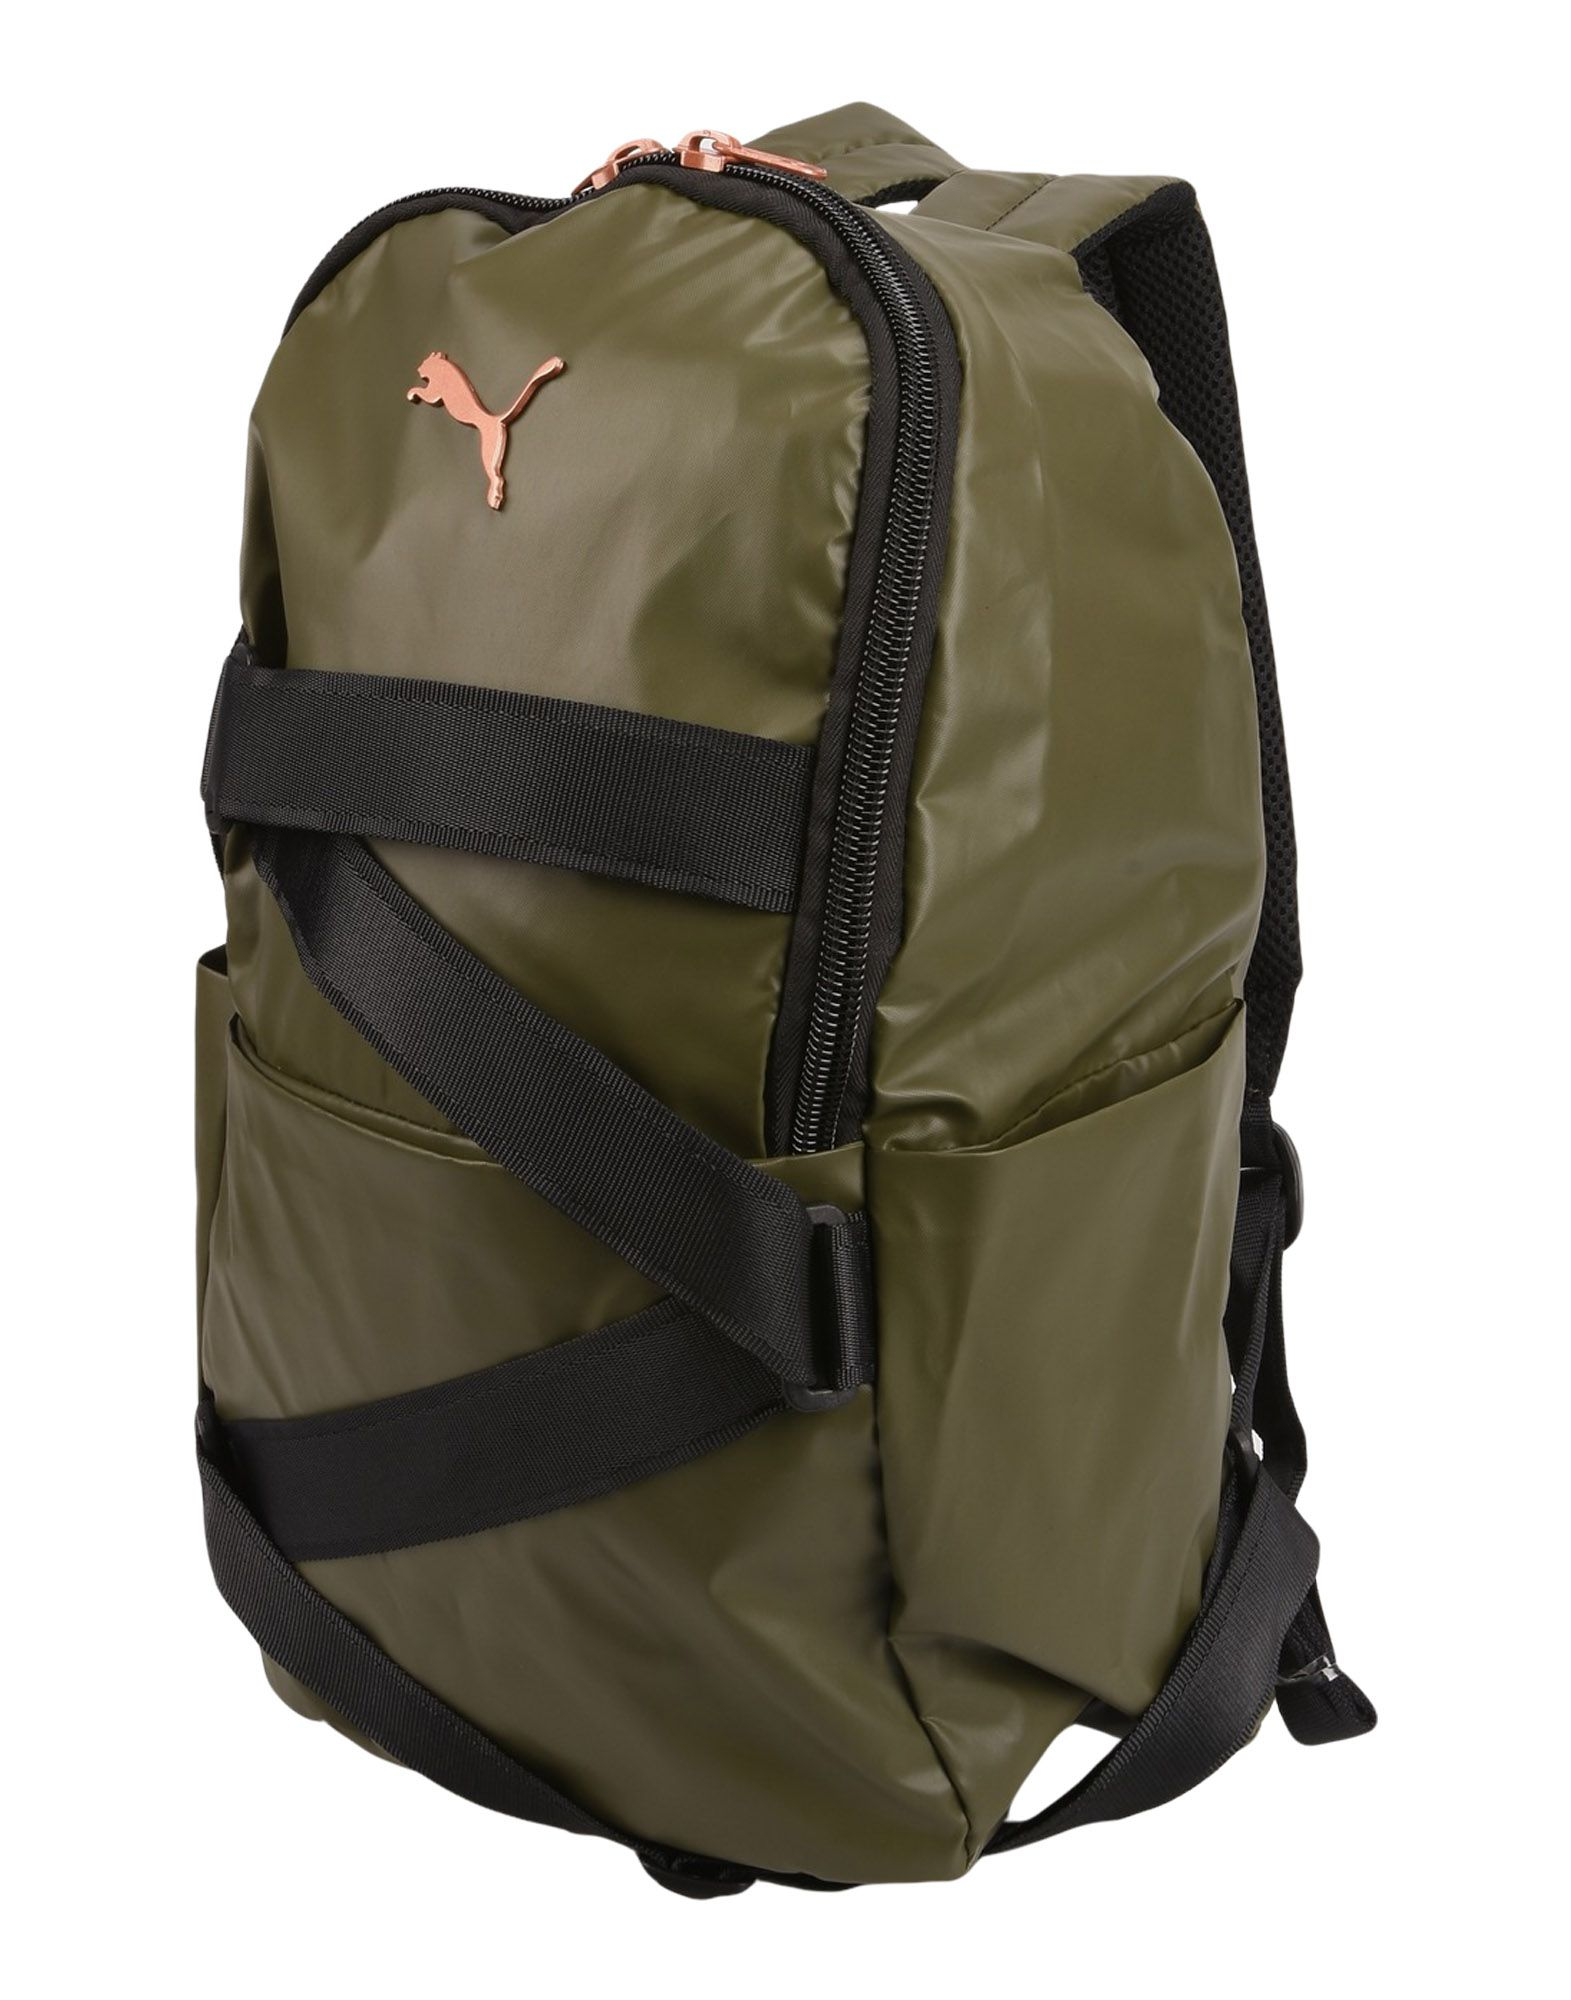 Puma Vr Combat Backpack - Rucksack   Bumbag - Women Puma Rucksacks ... 14f8d8f889631